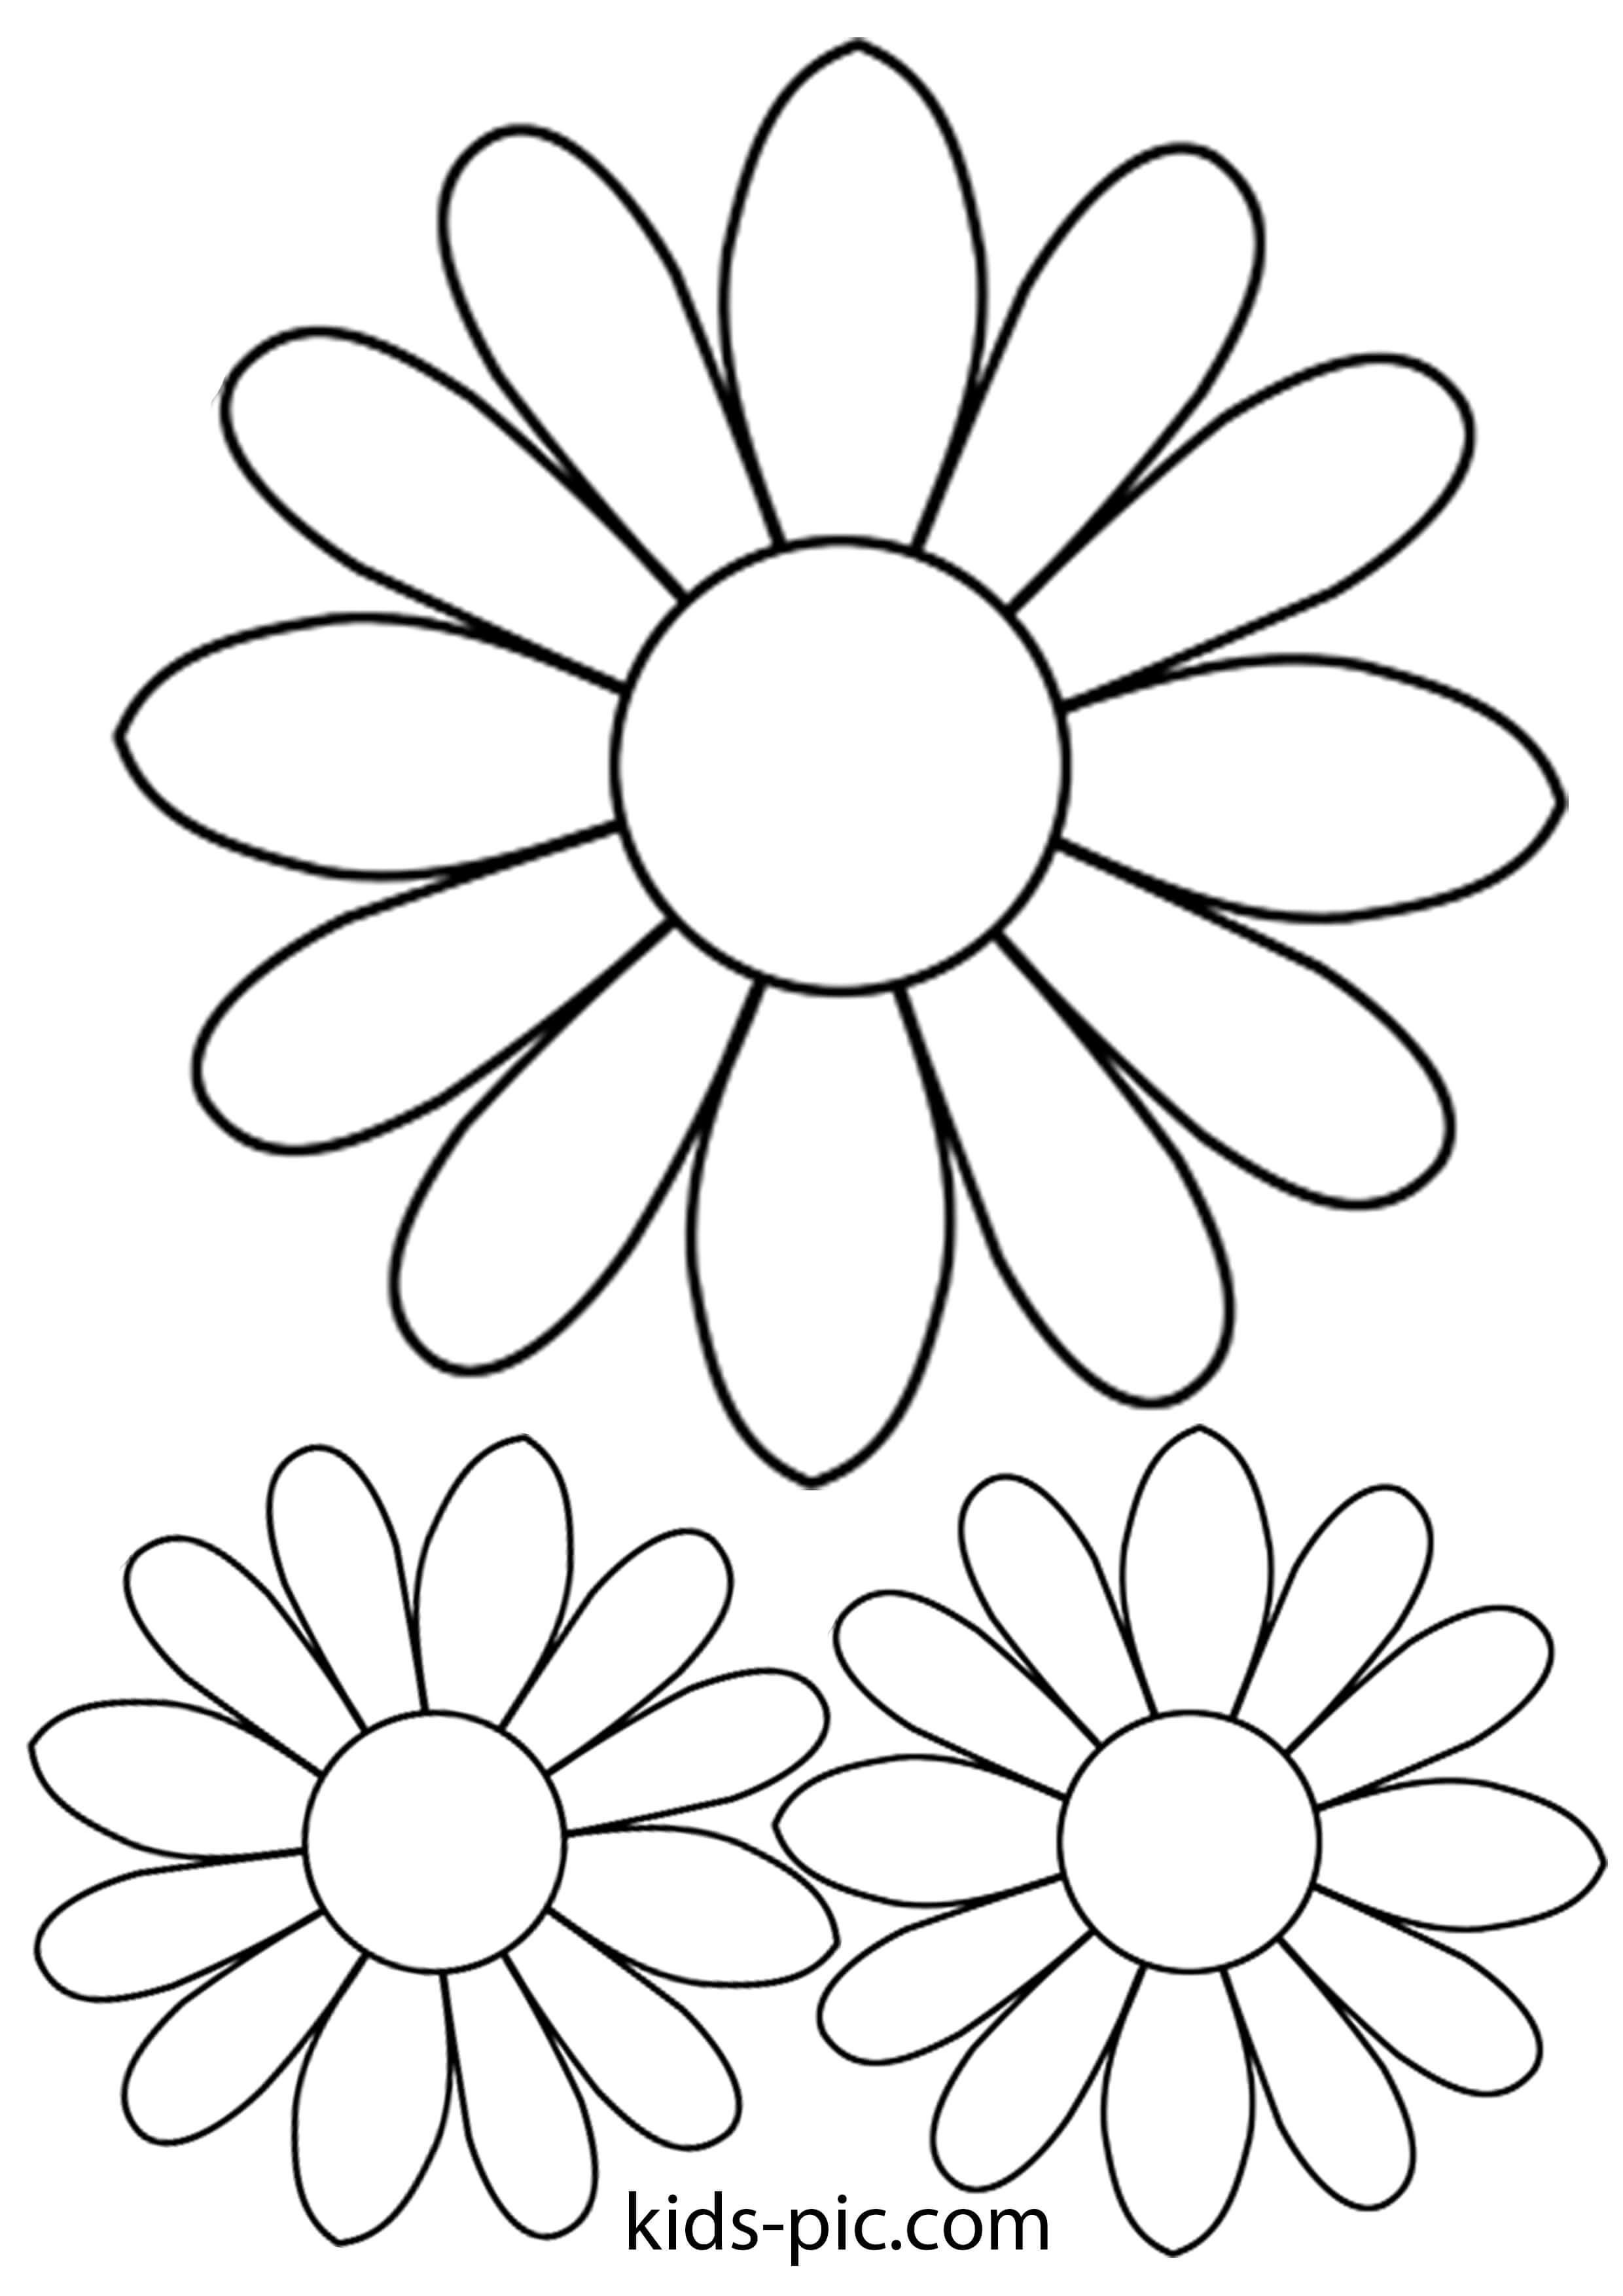 резной цветок ромашка картинка шаблон таких паразитов